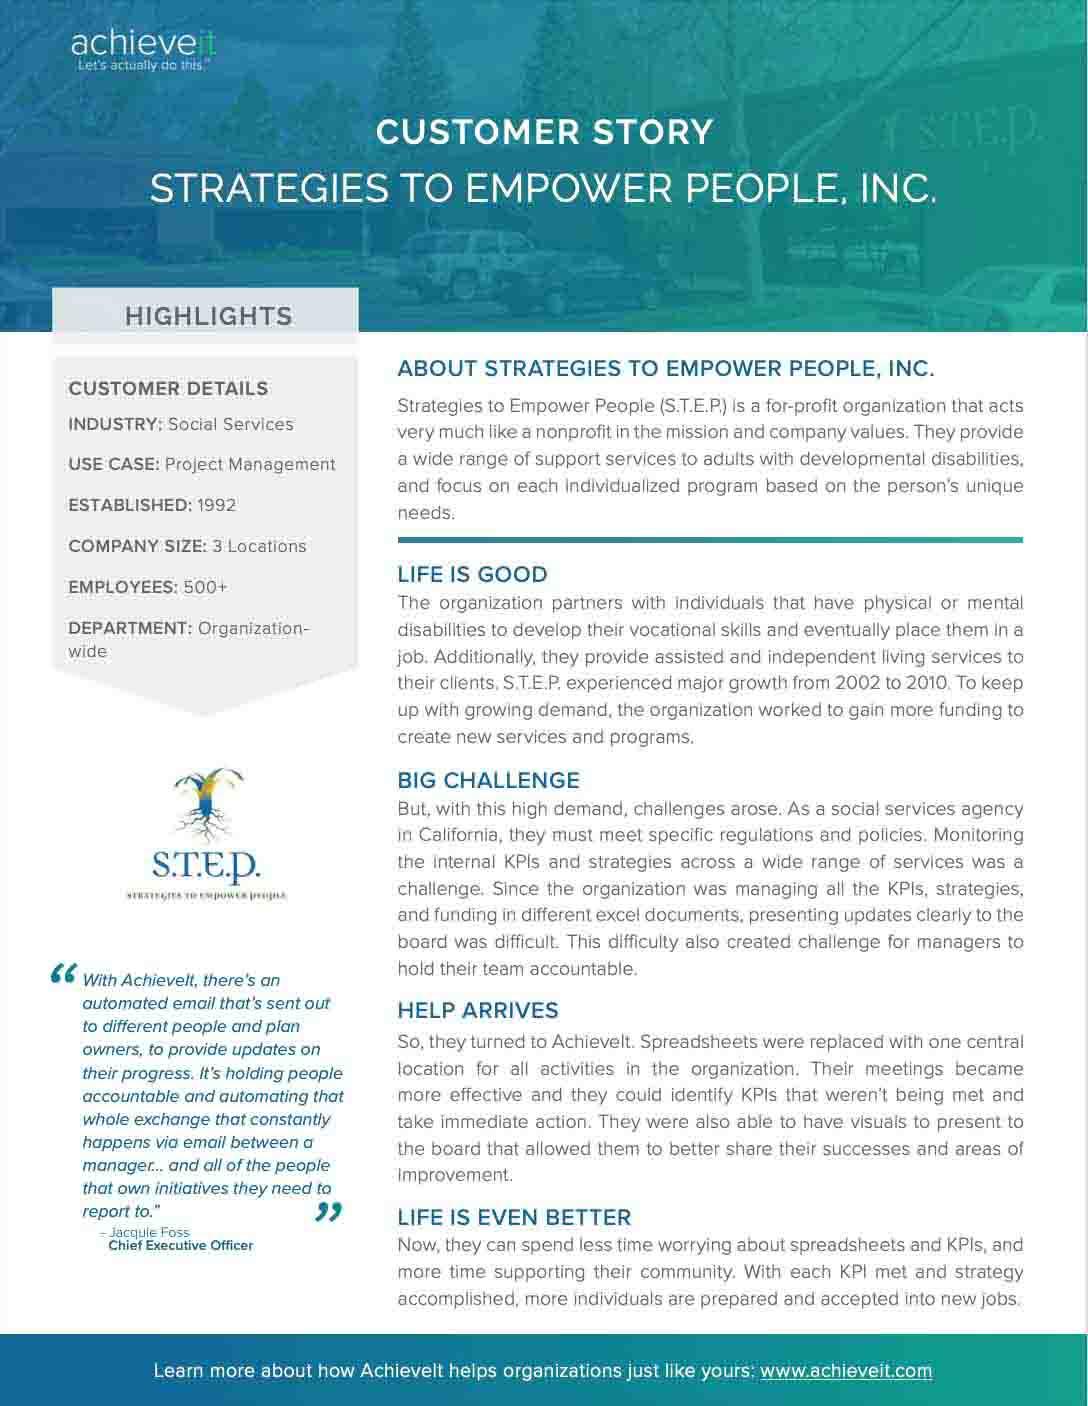 Strategies to Empower People (S.T.E.P)_achieveit